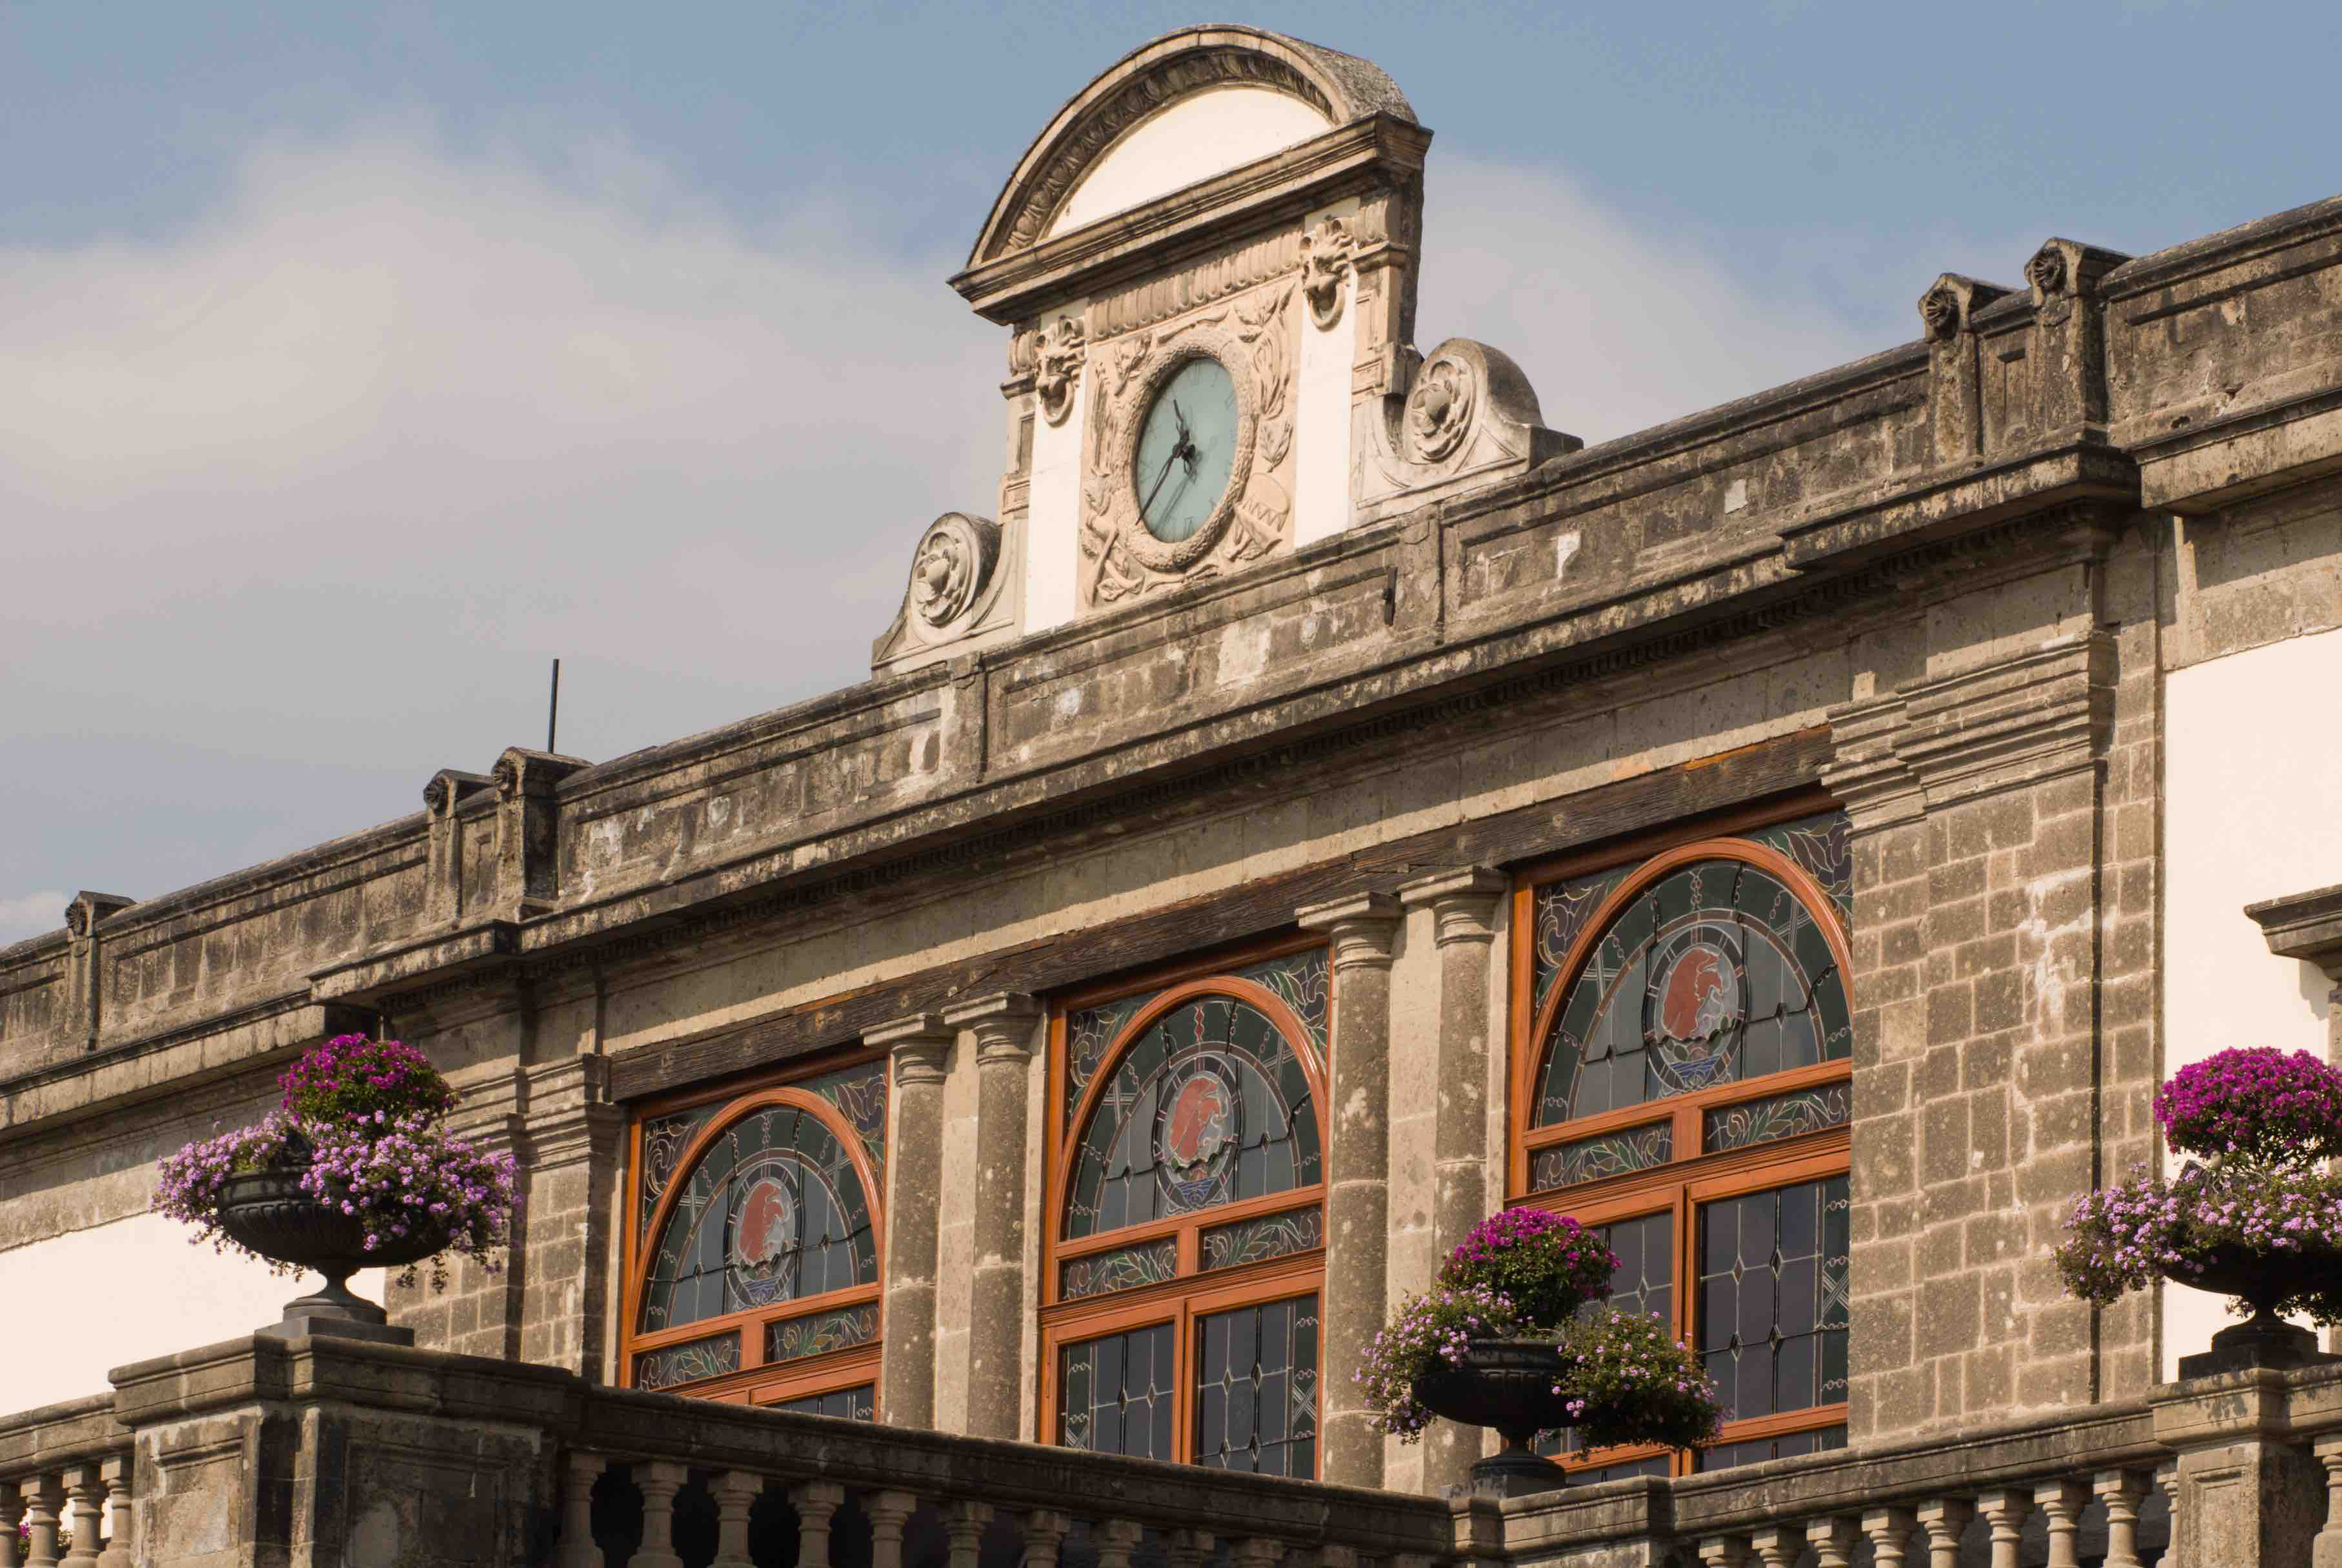 'Game of Thrones' Will Reportedly Film an Alternative Finale in Mexico's Castillo de Chapultepec